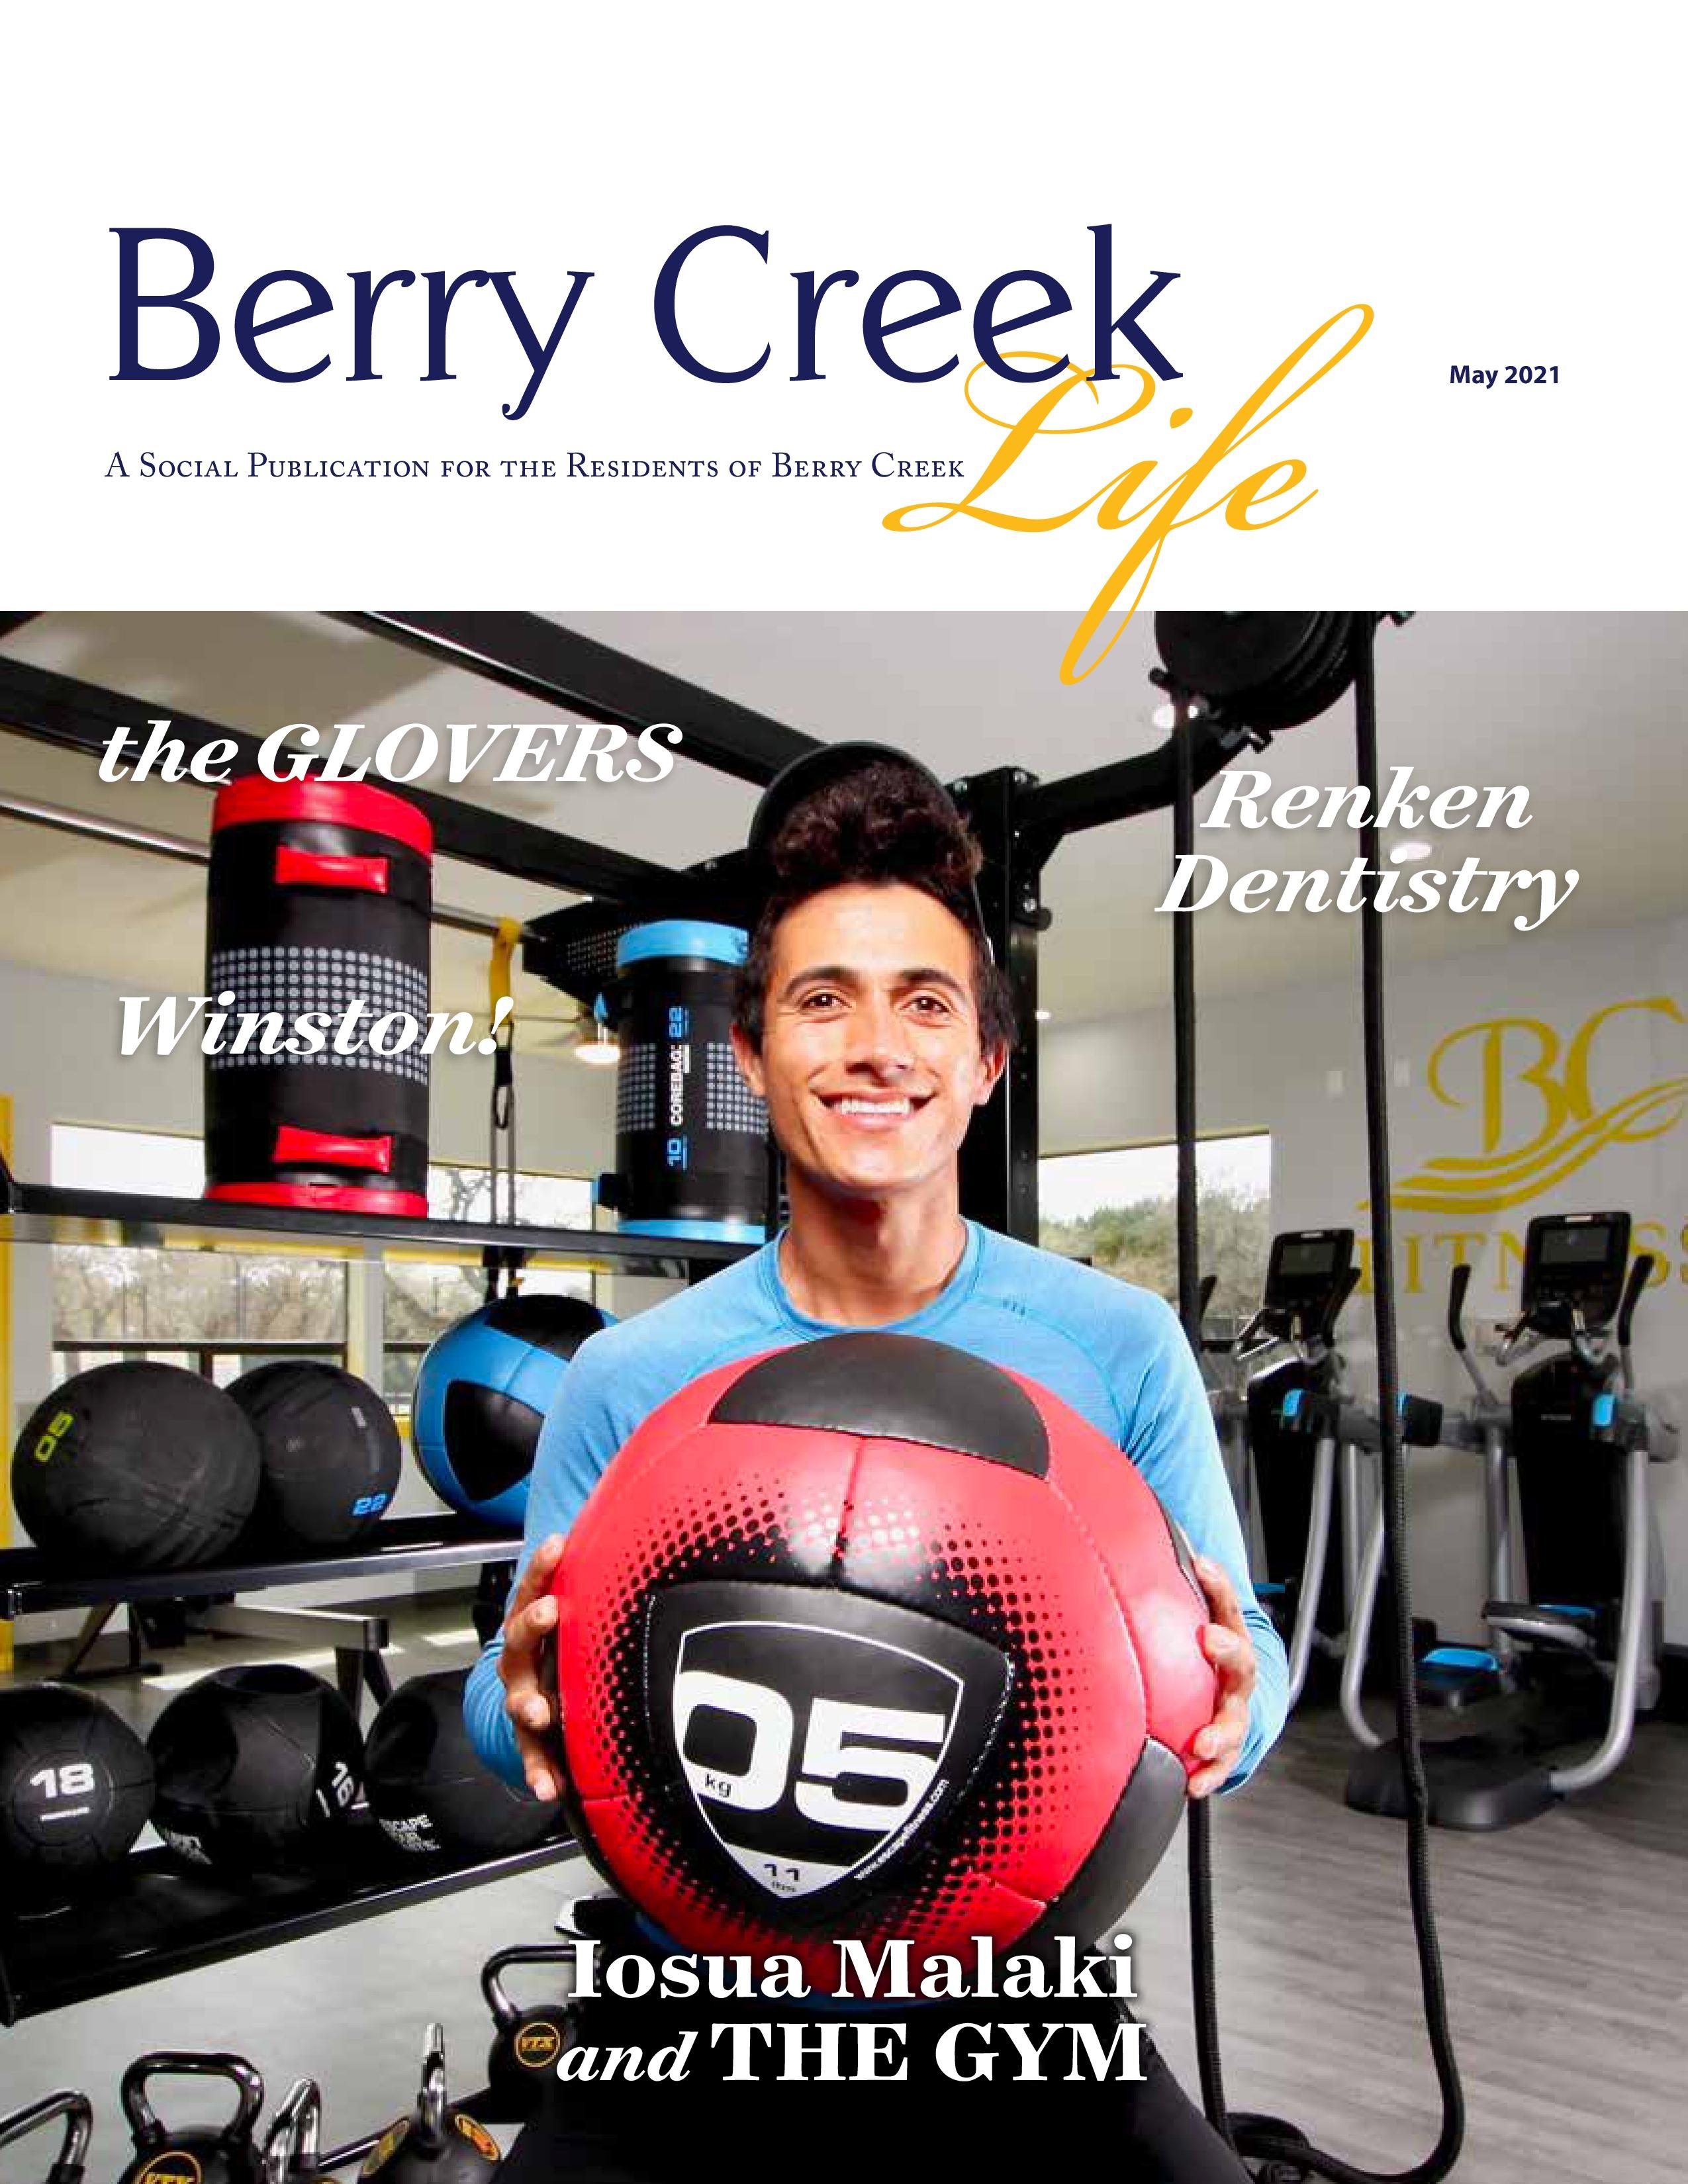 Berry Creek Life 2021-05-01